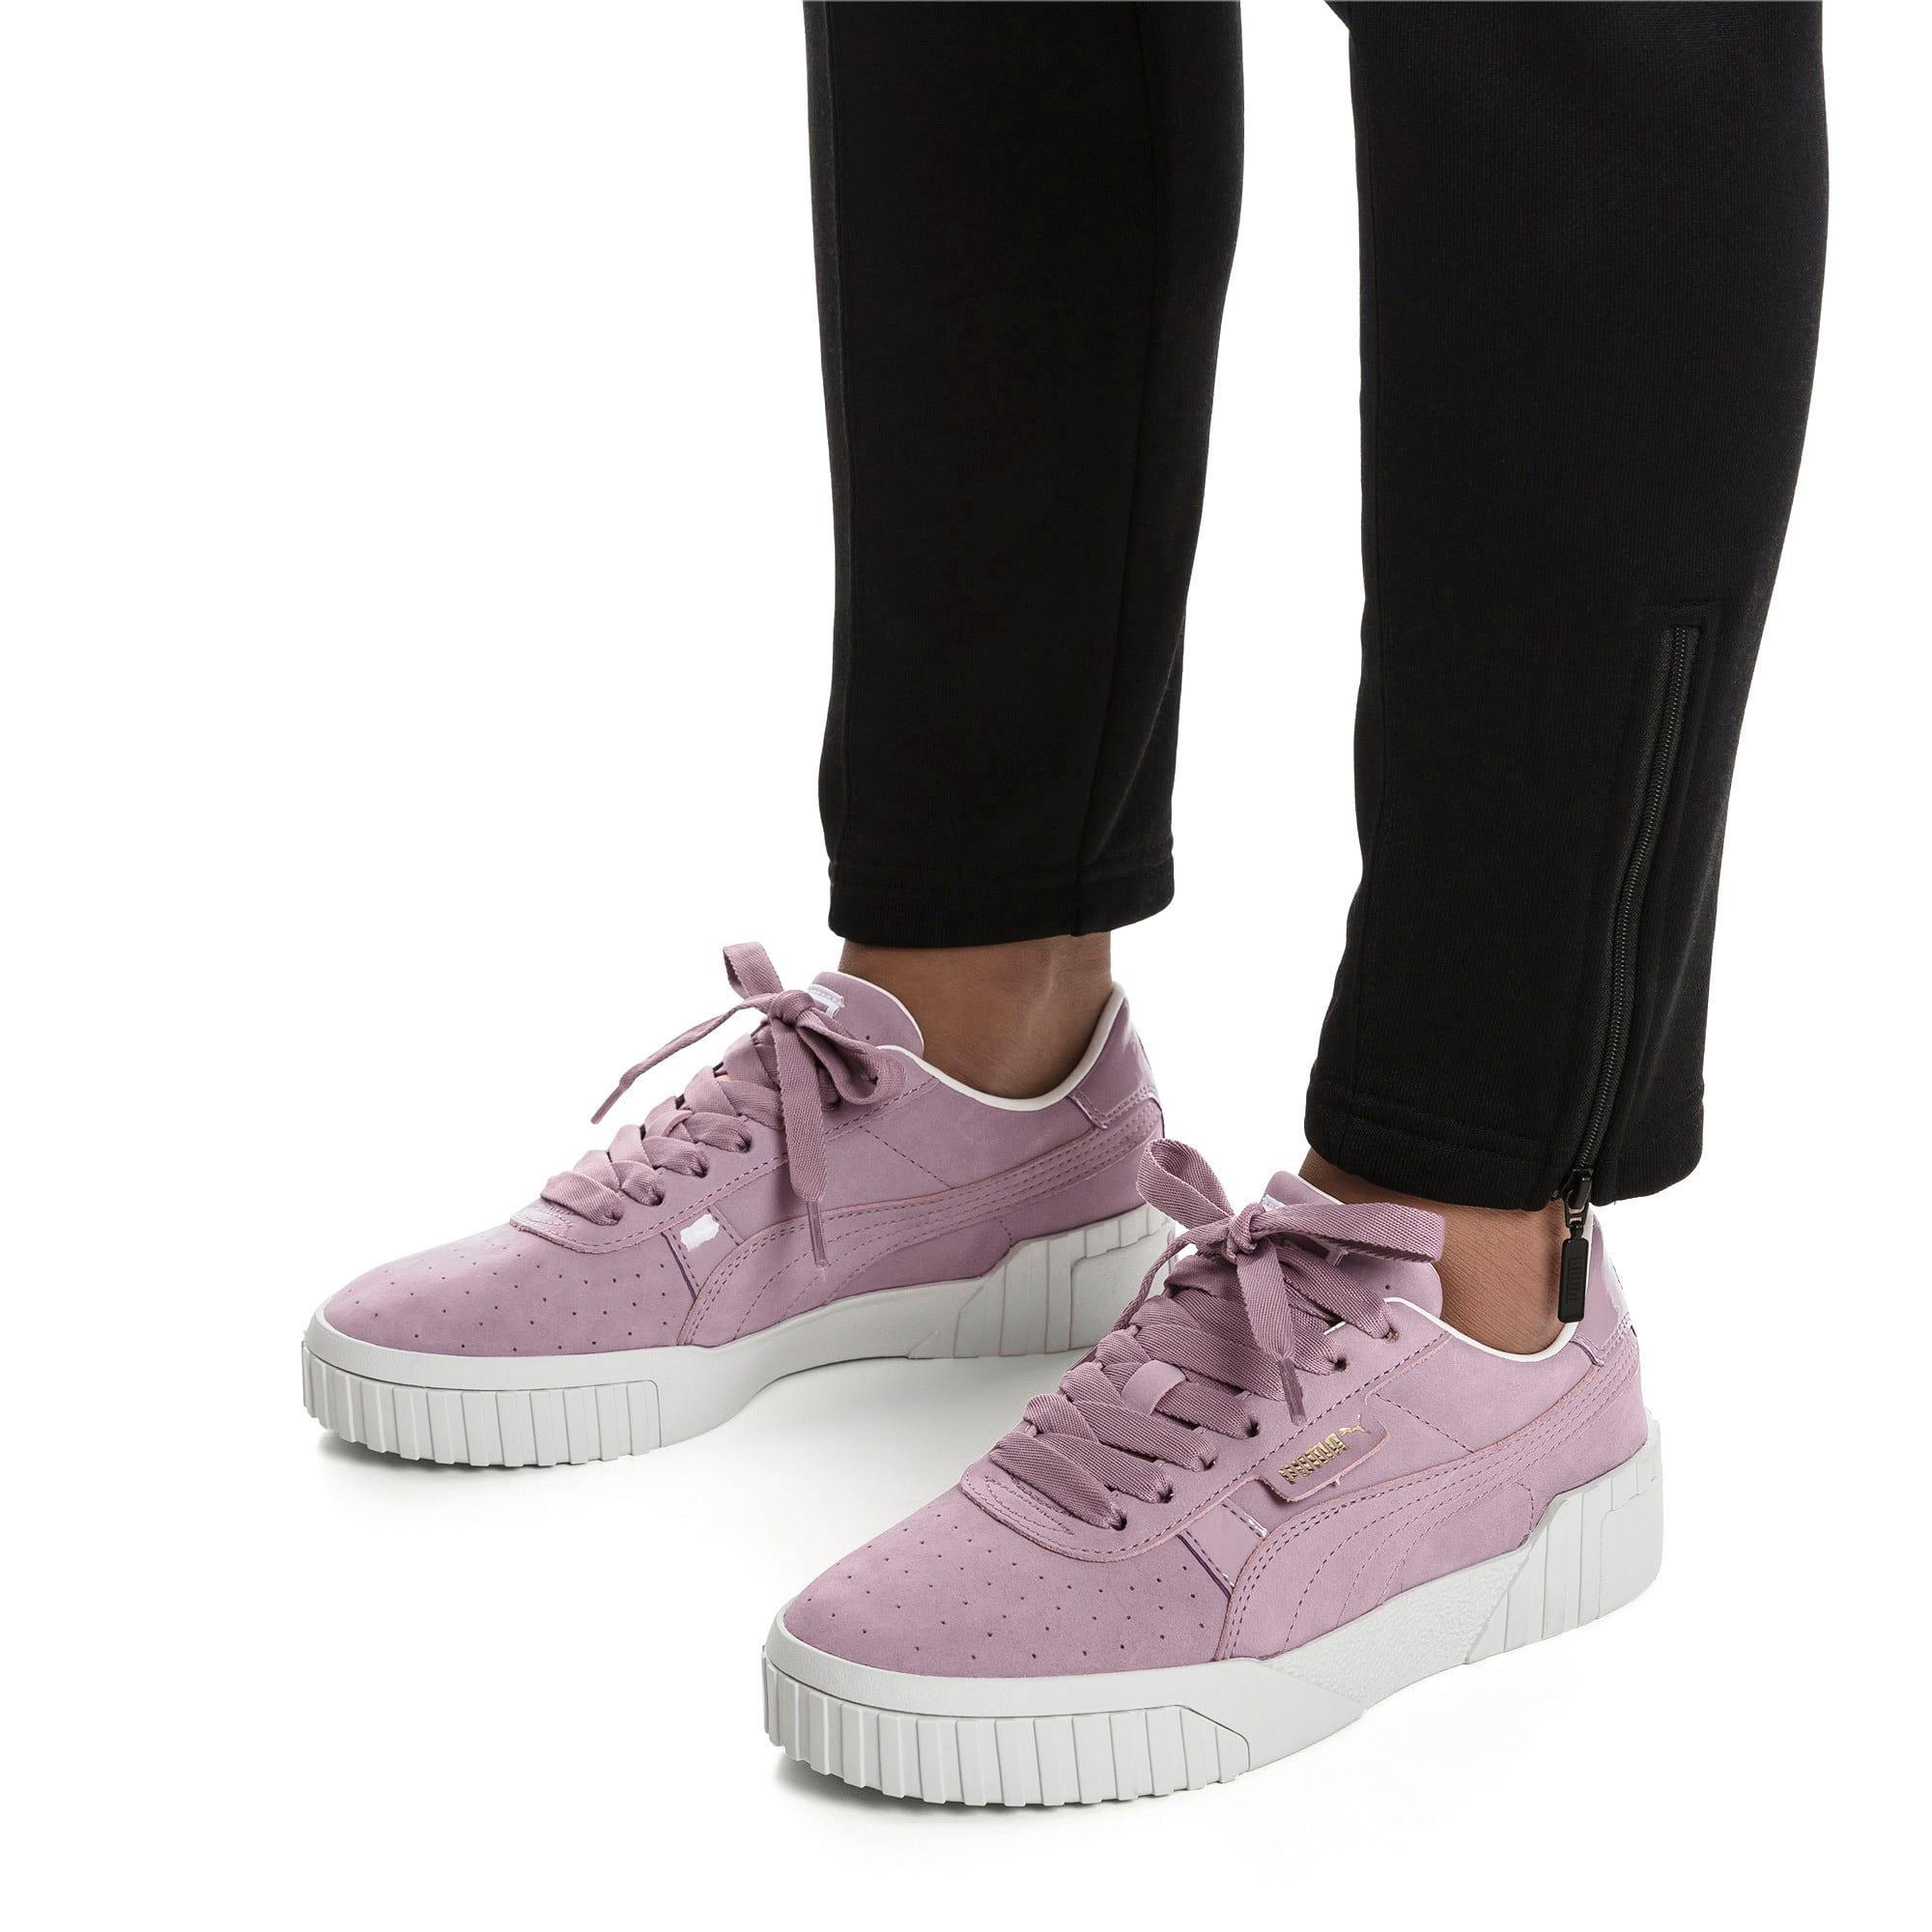 Thumbnail 3 of Cali Nubuck Women's Sneakers, Elderberry, medium